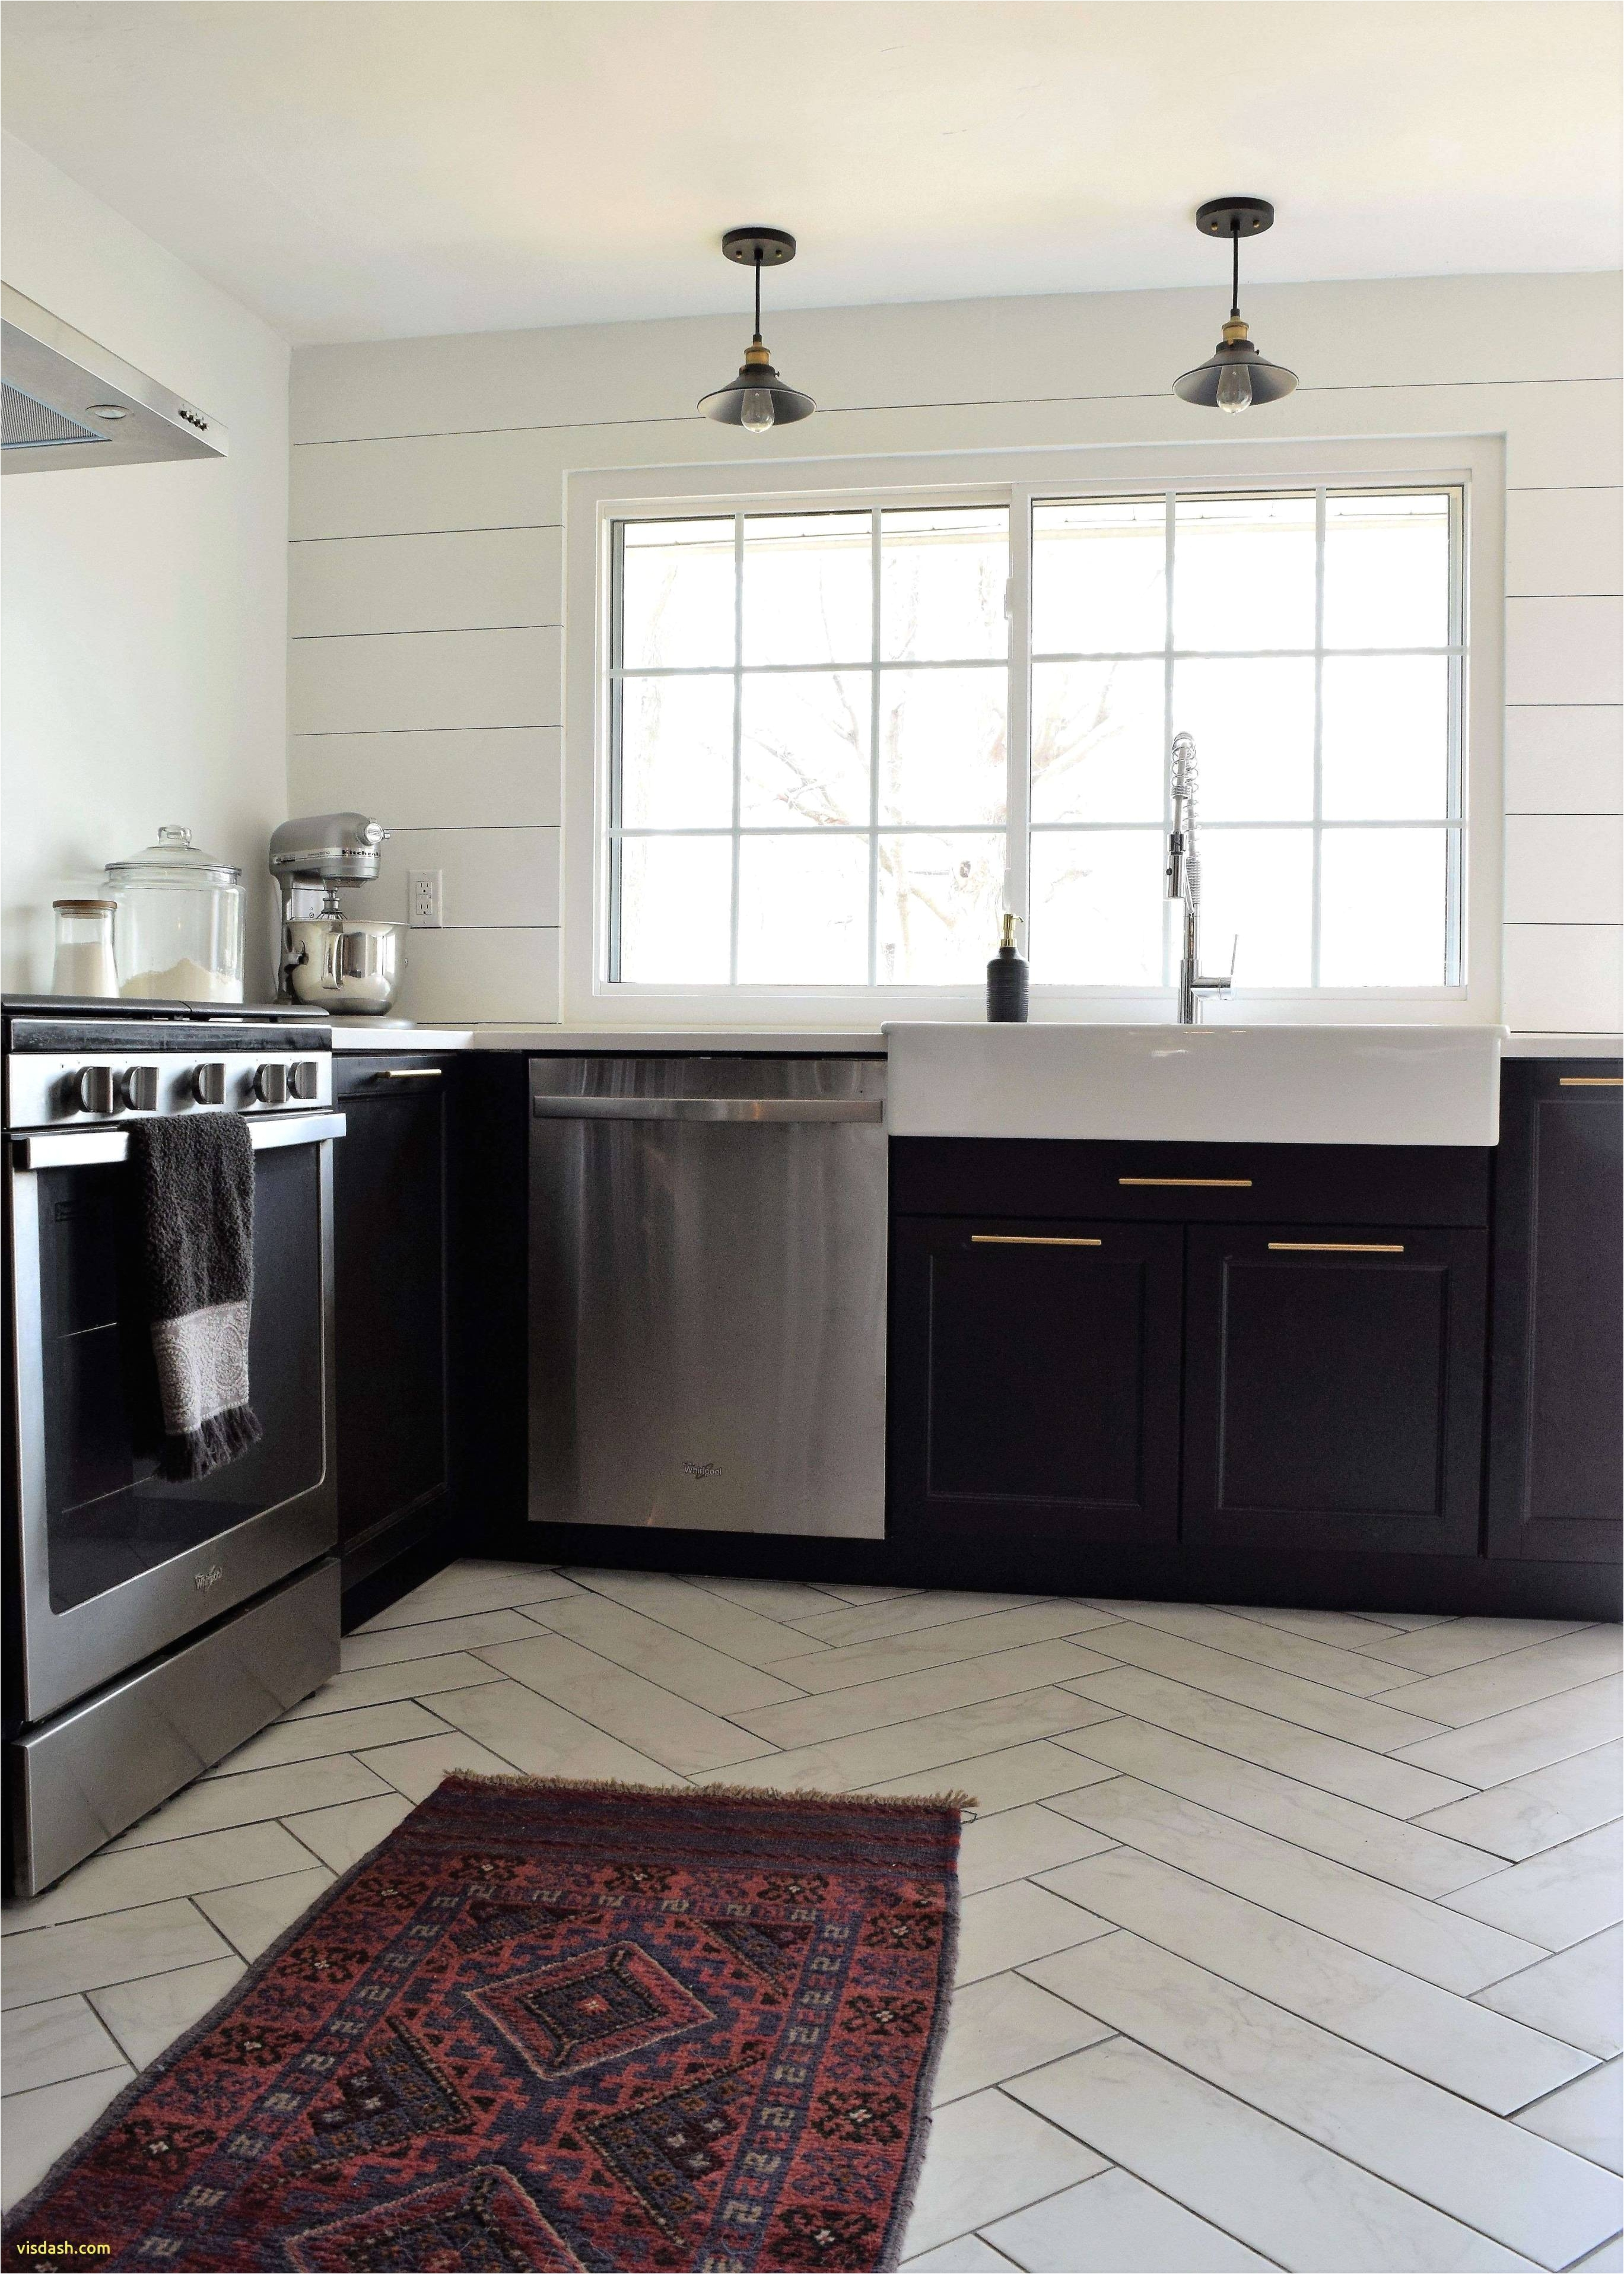 ceramic kitchen backsplash Download Glass Kitchen Backsplash Tiles Kitchen Design 0d Design Kitchen Ideas Design